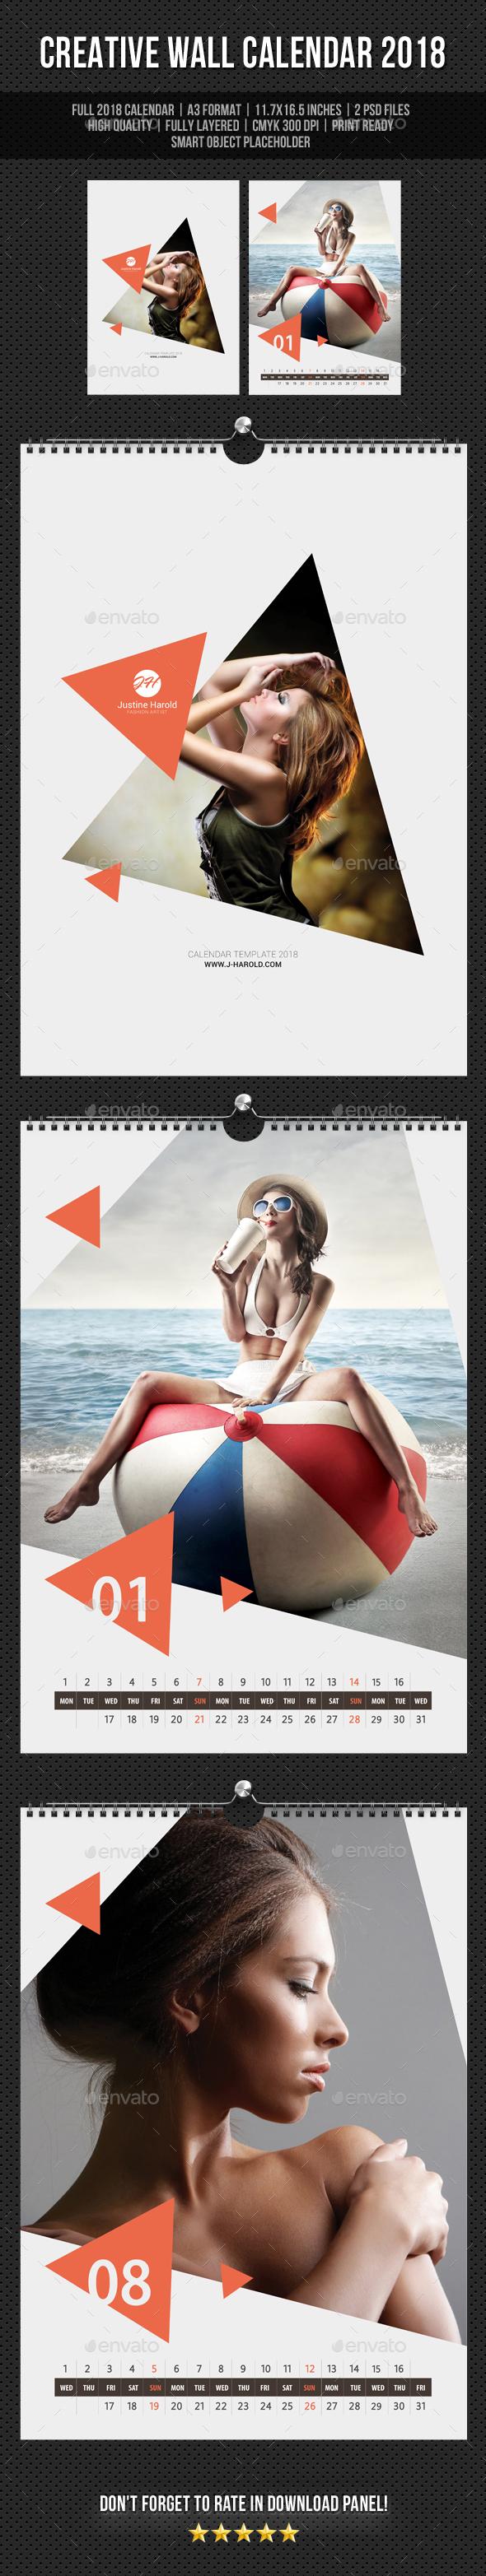 Creative Wall Calendar 2018 V19 - Calendars Stationery